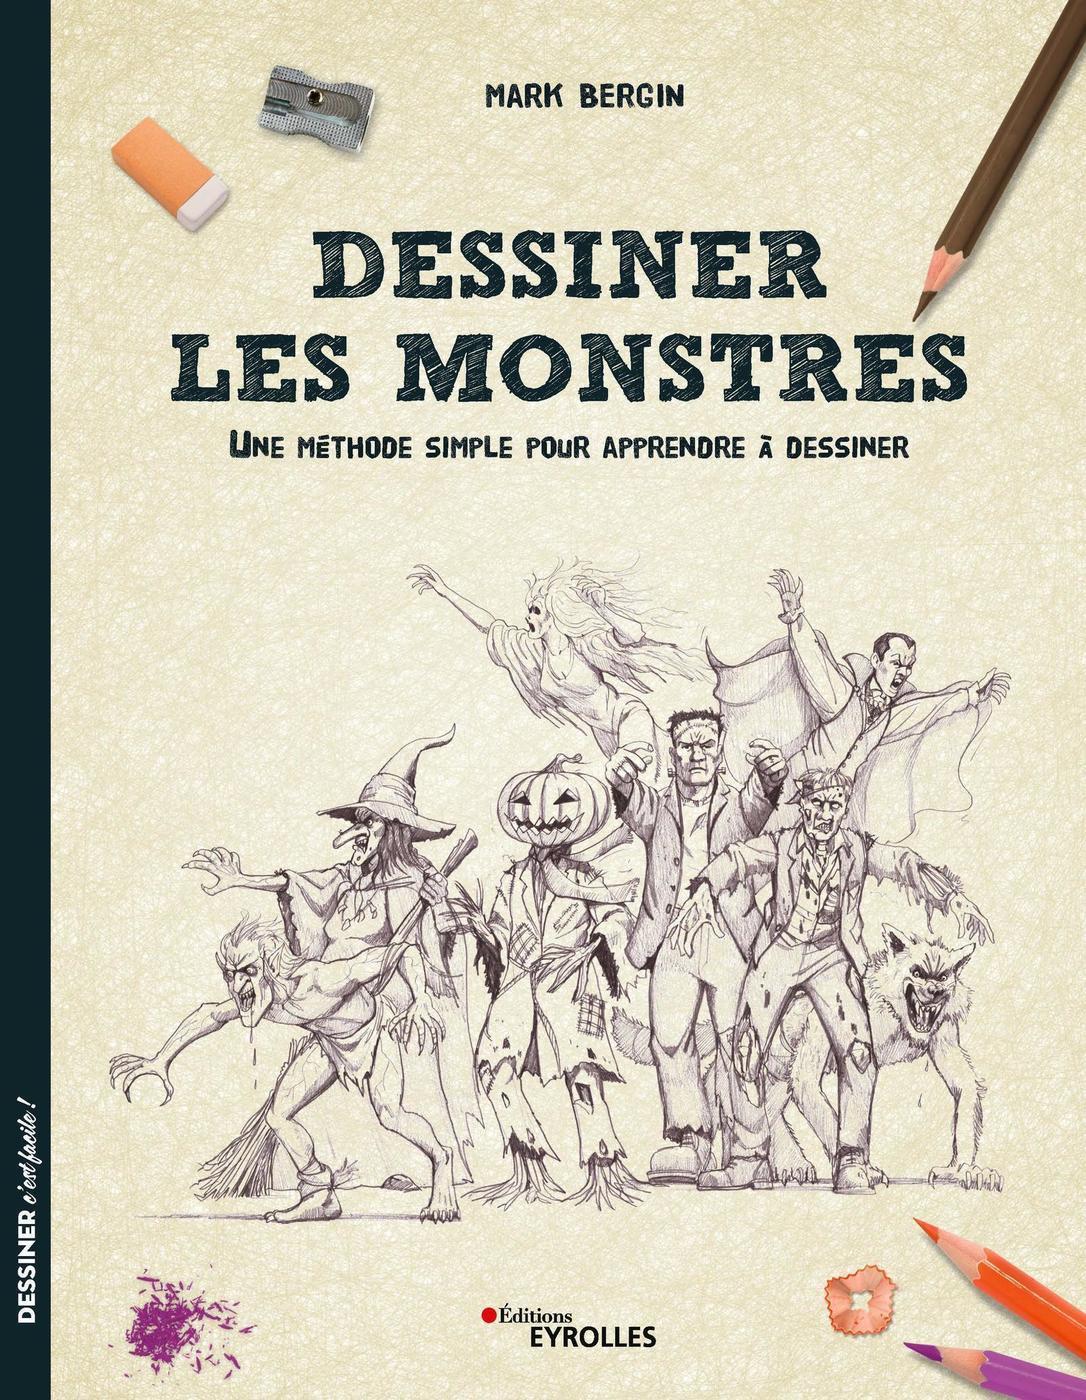 Dessiner Les Monstres Mbergin Librairie Eyrolles